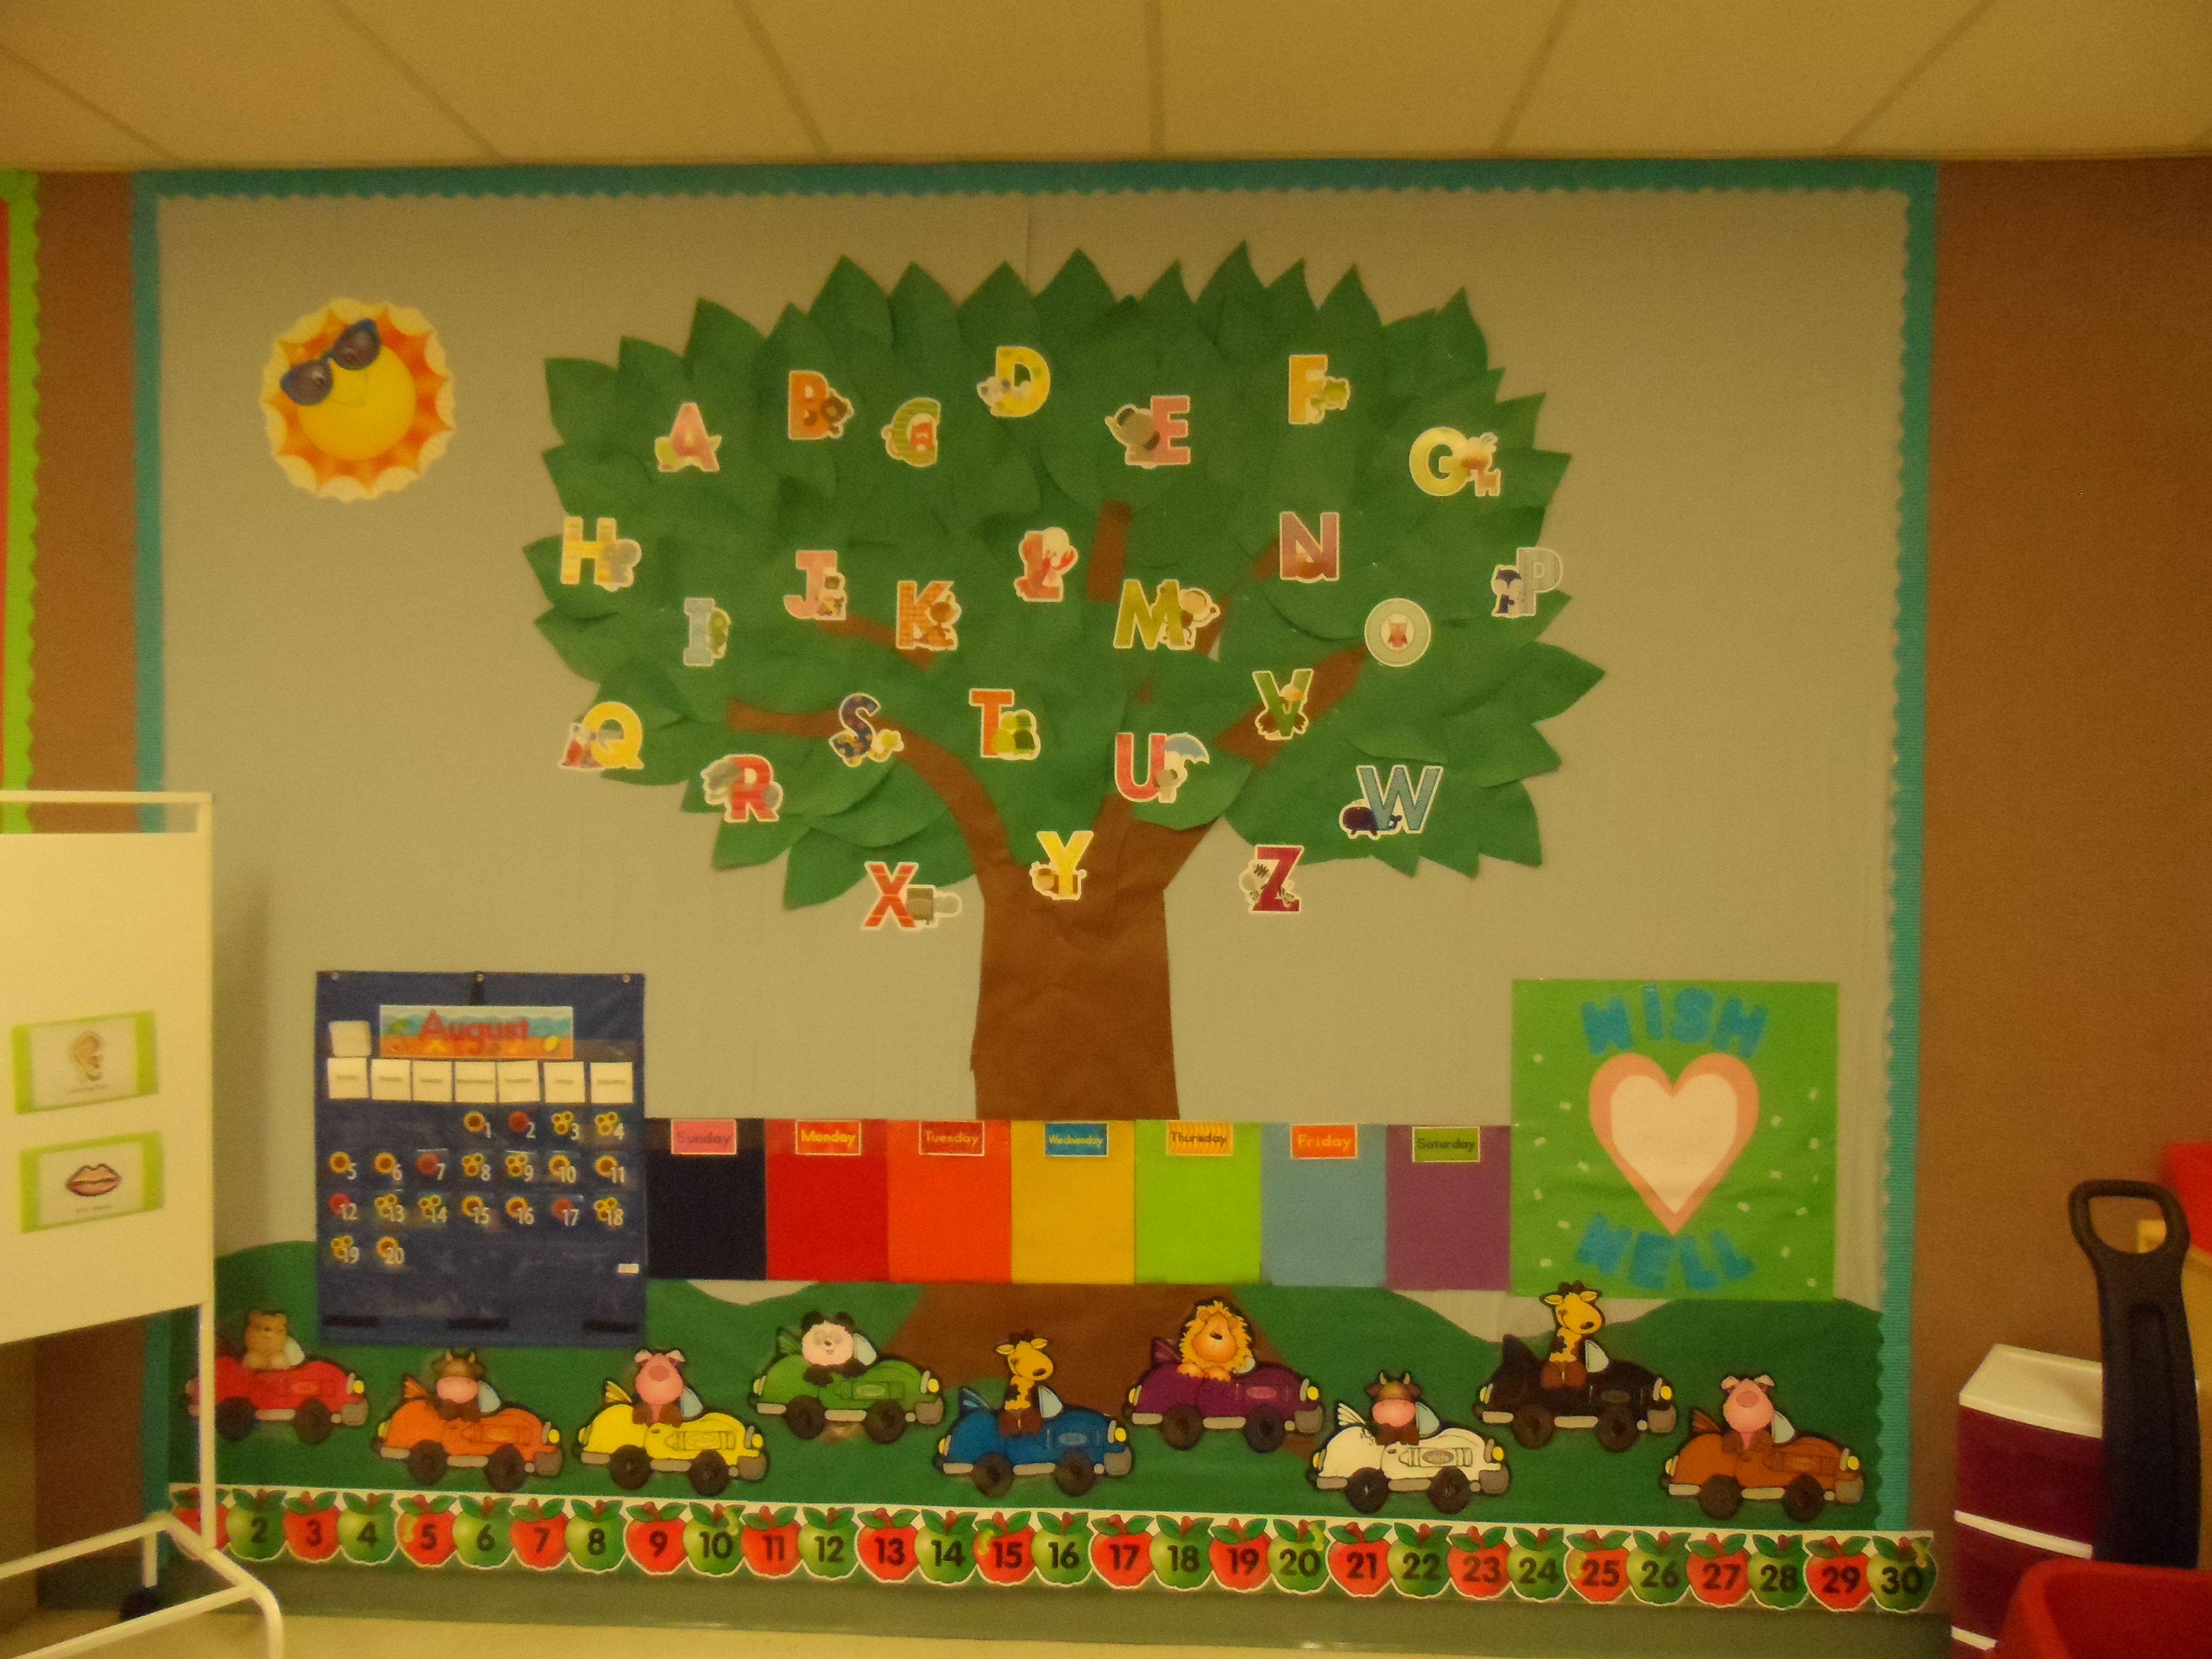 Classroom Calendar Bulletin Board Ideas : Circle time area bulletin board i created includes